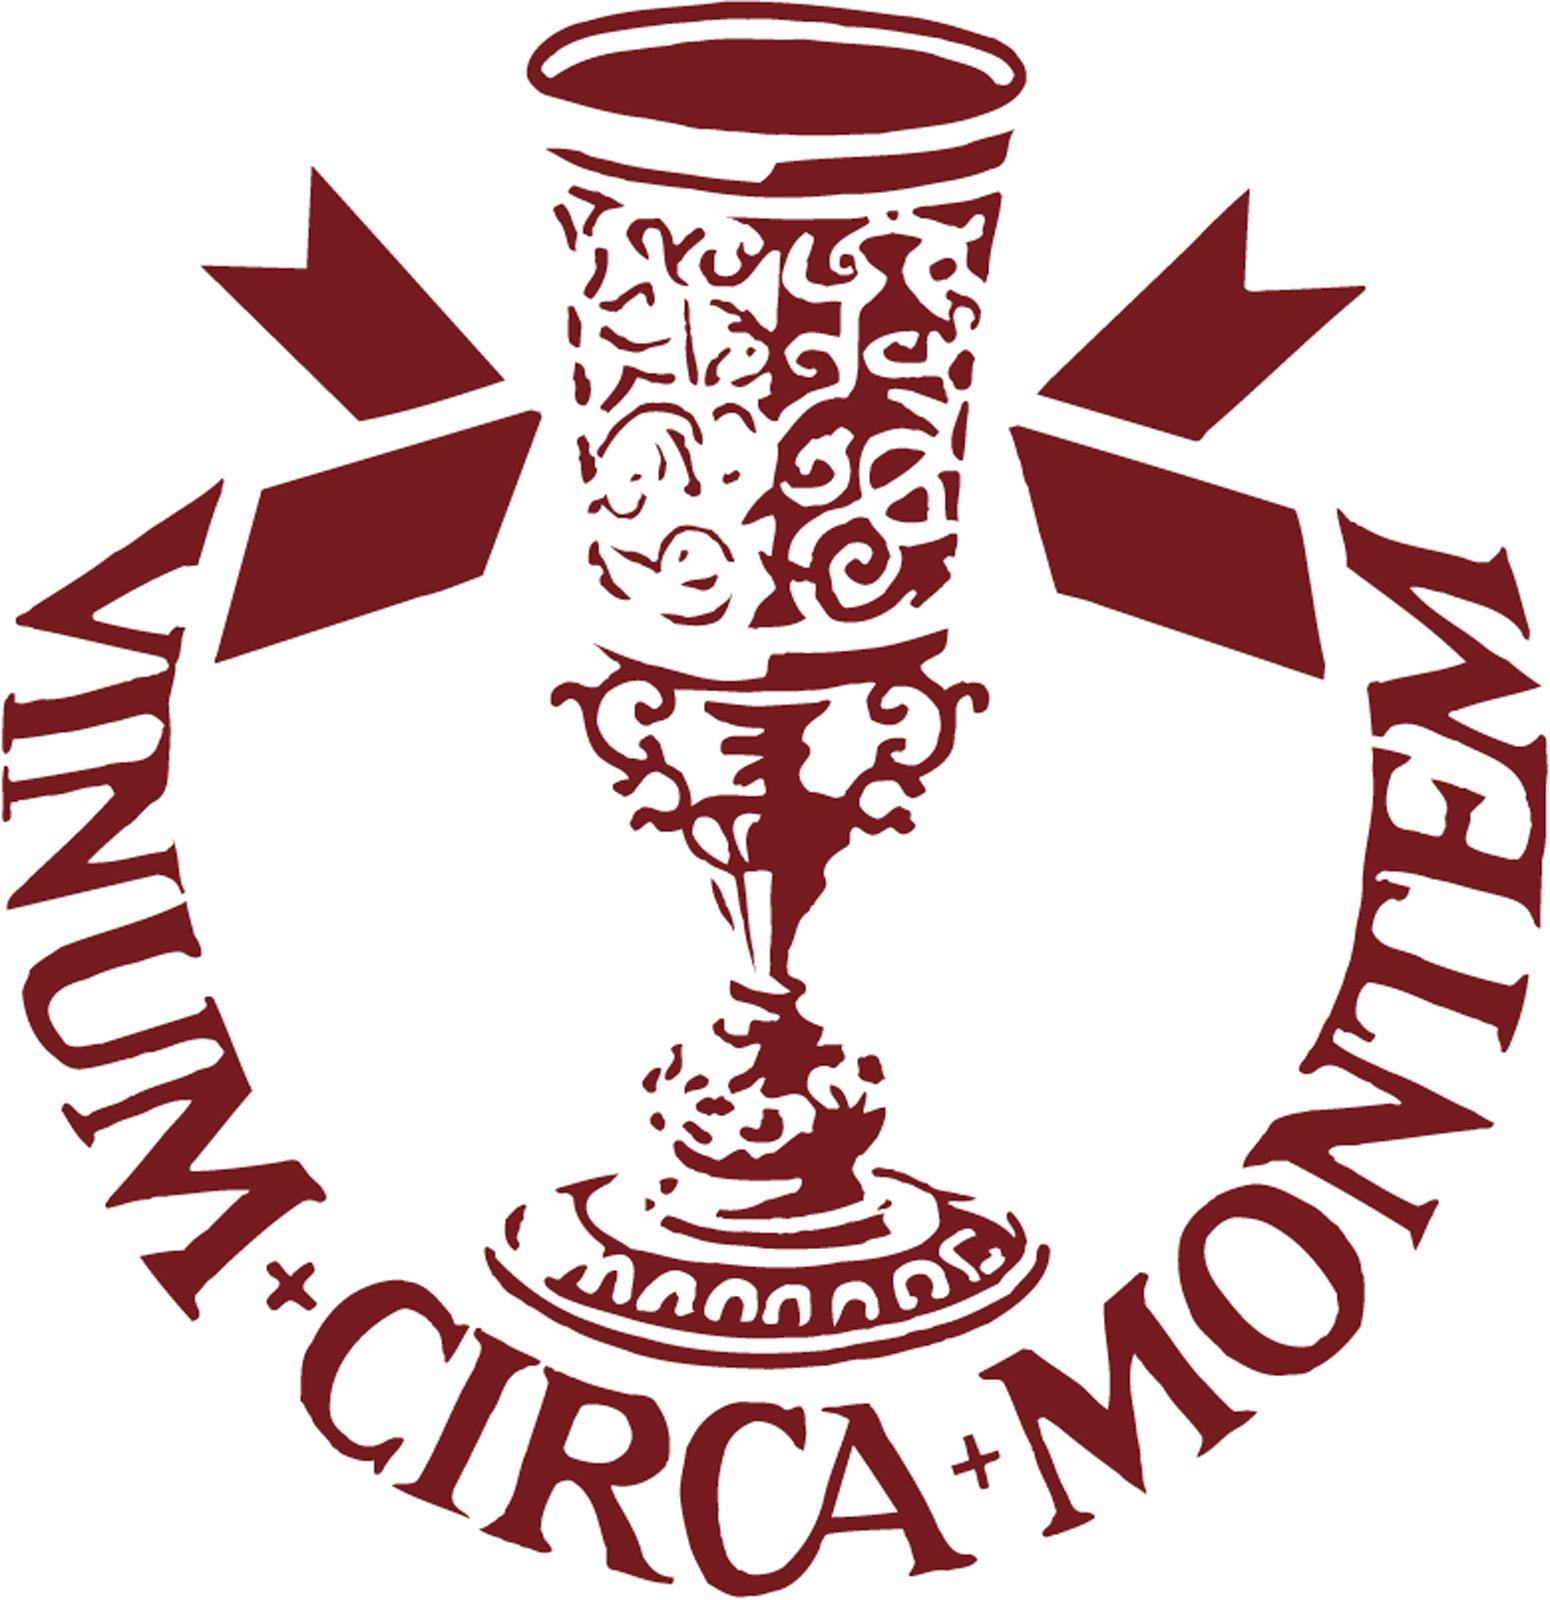 vinum_circa_montem_hellblau.jpg